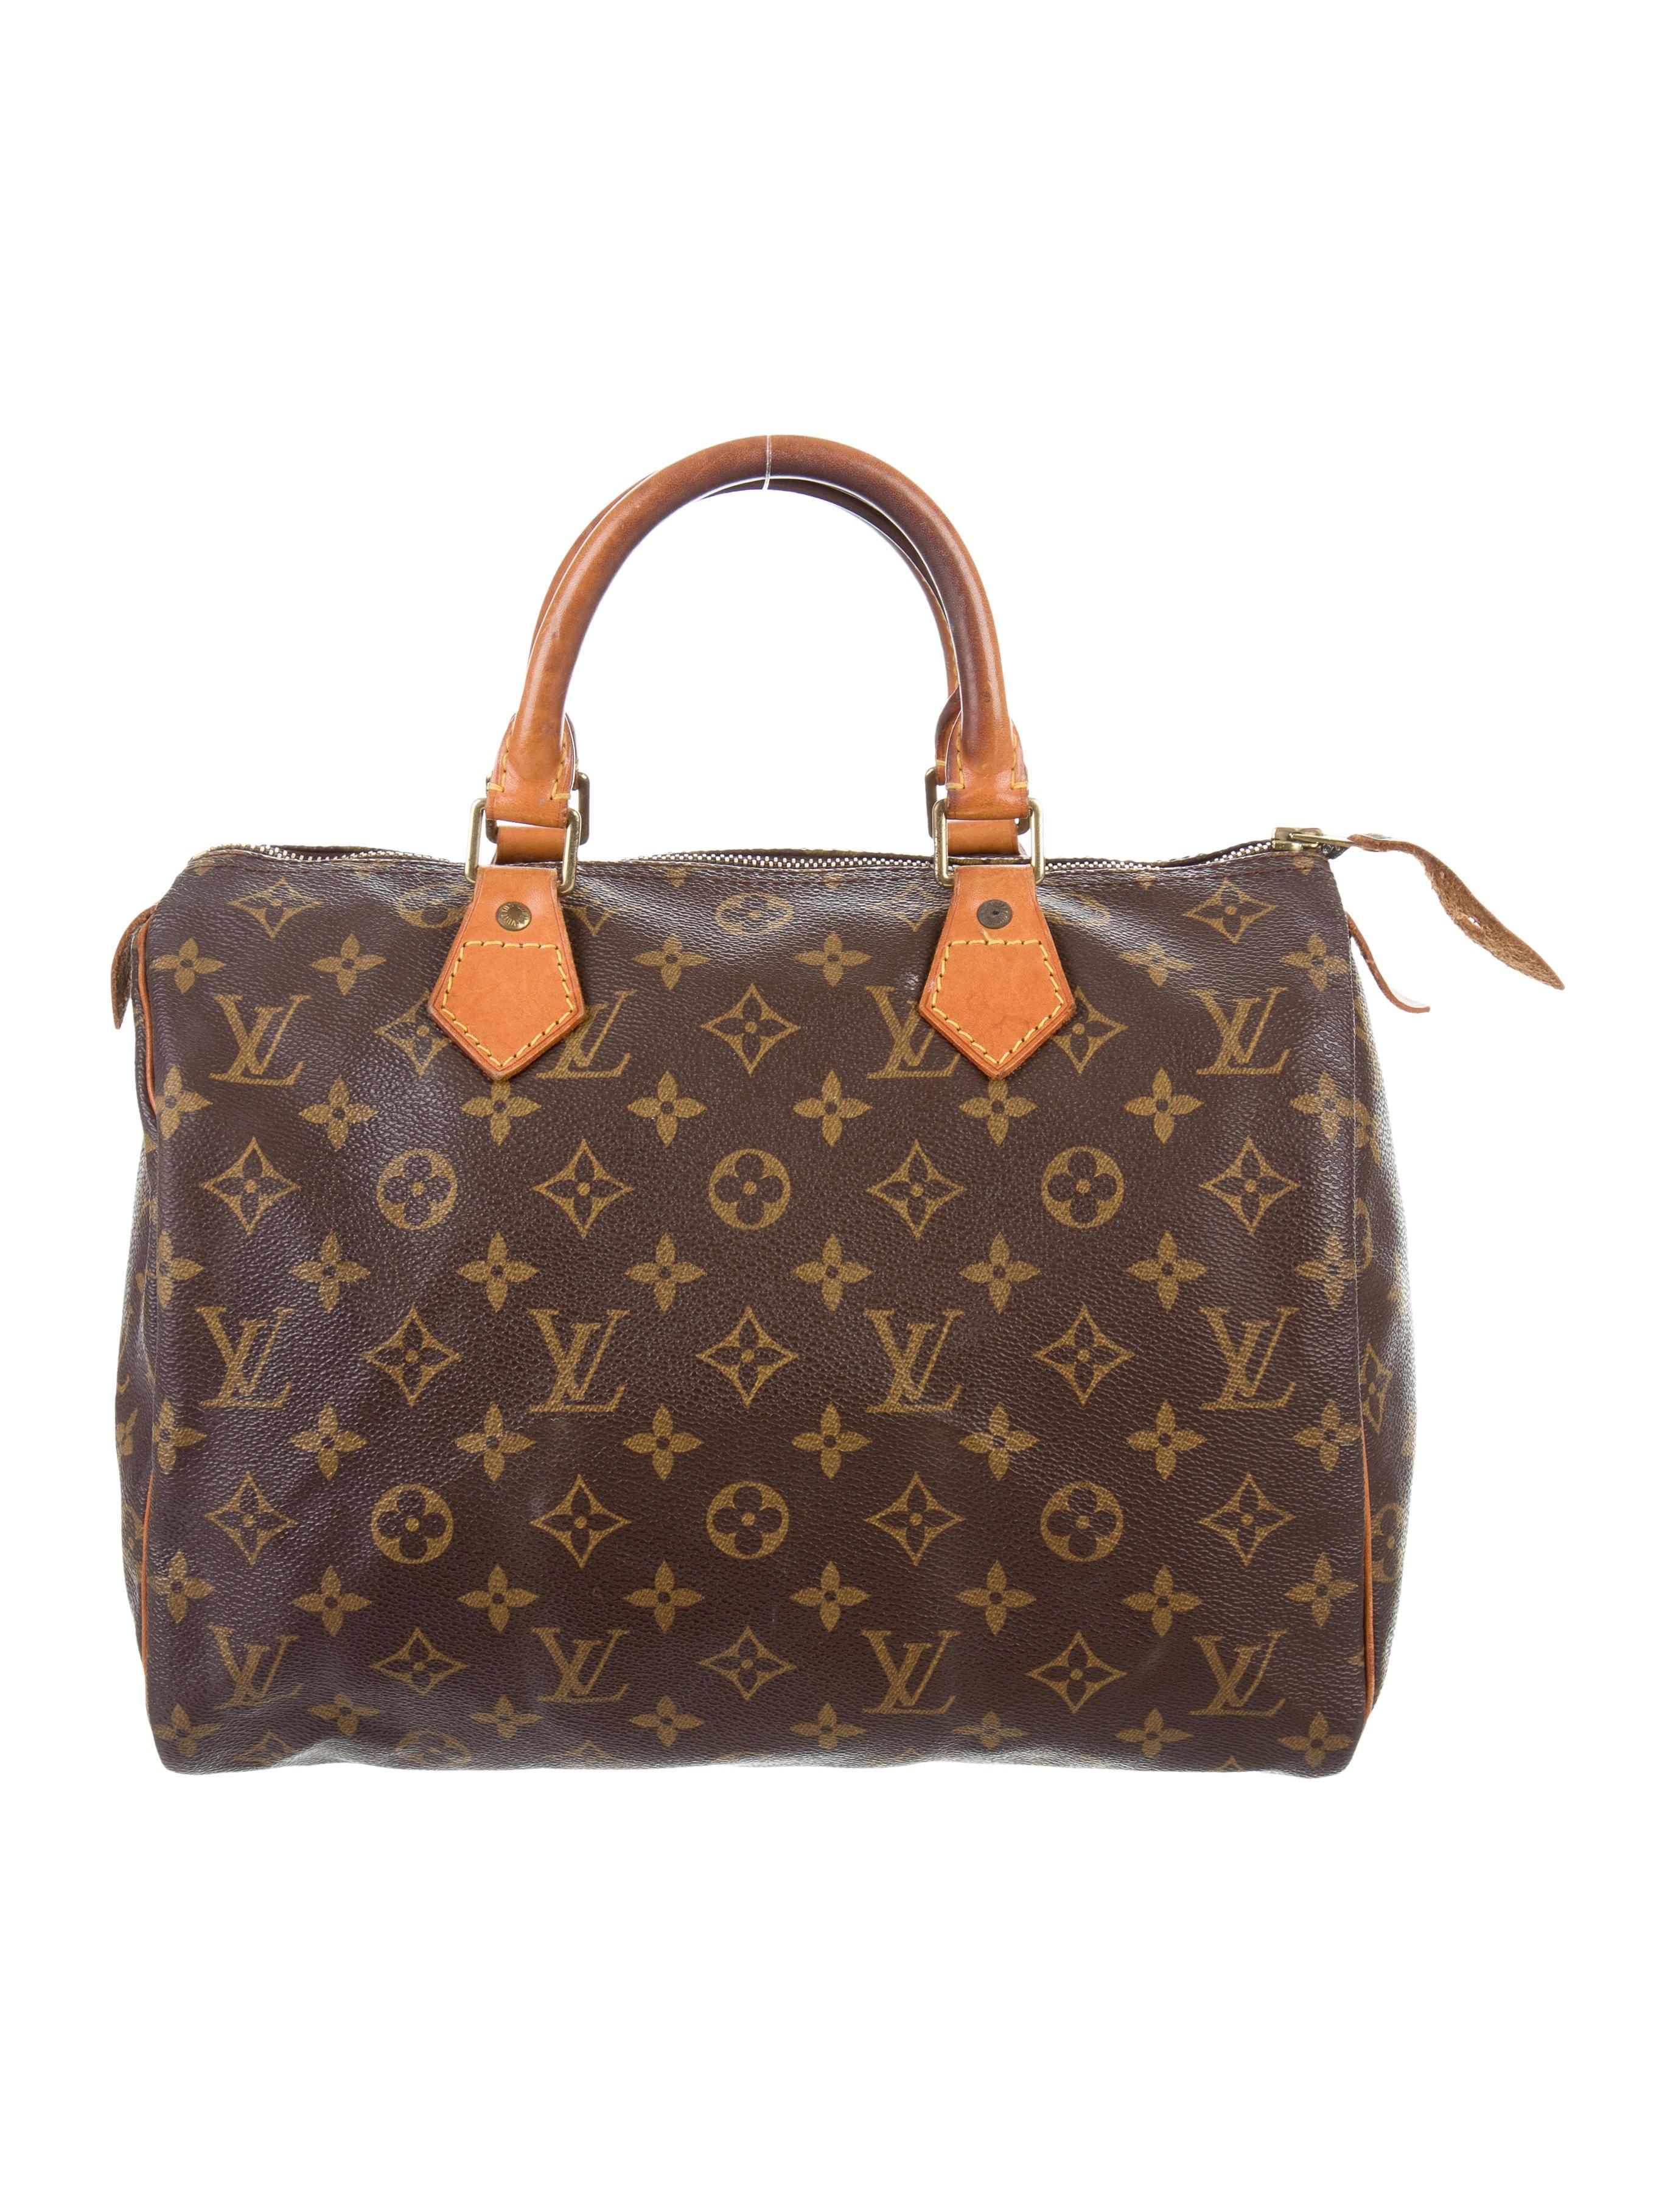 louis vuitton monogram speedy 30 handbags lou119109. Black Bedroom Furniture Sets. Home Design Ideas